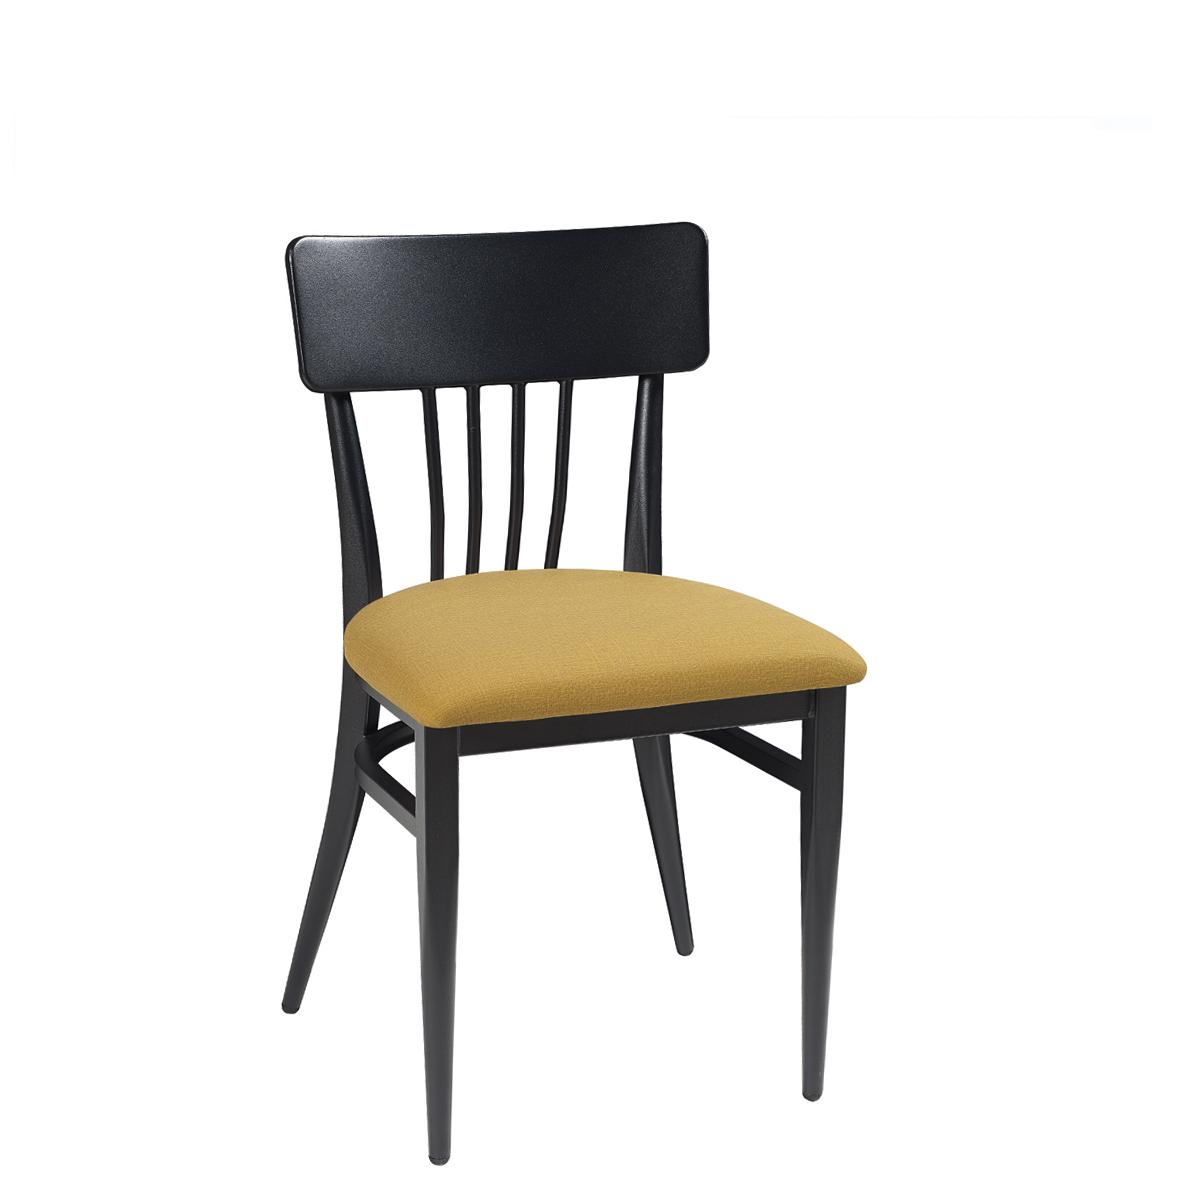 nebraska-silla-negro-tapizado-mostaza